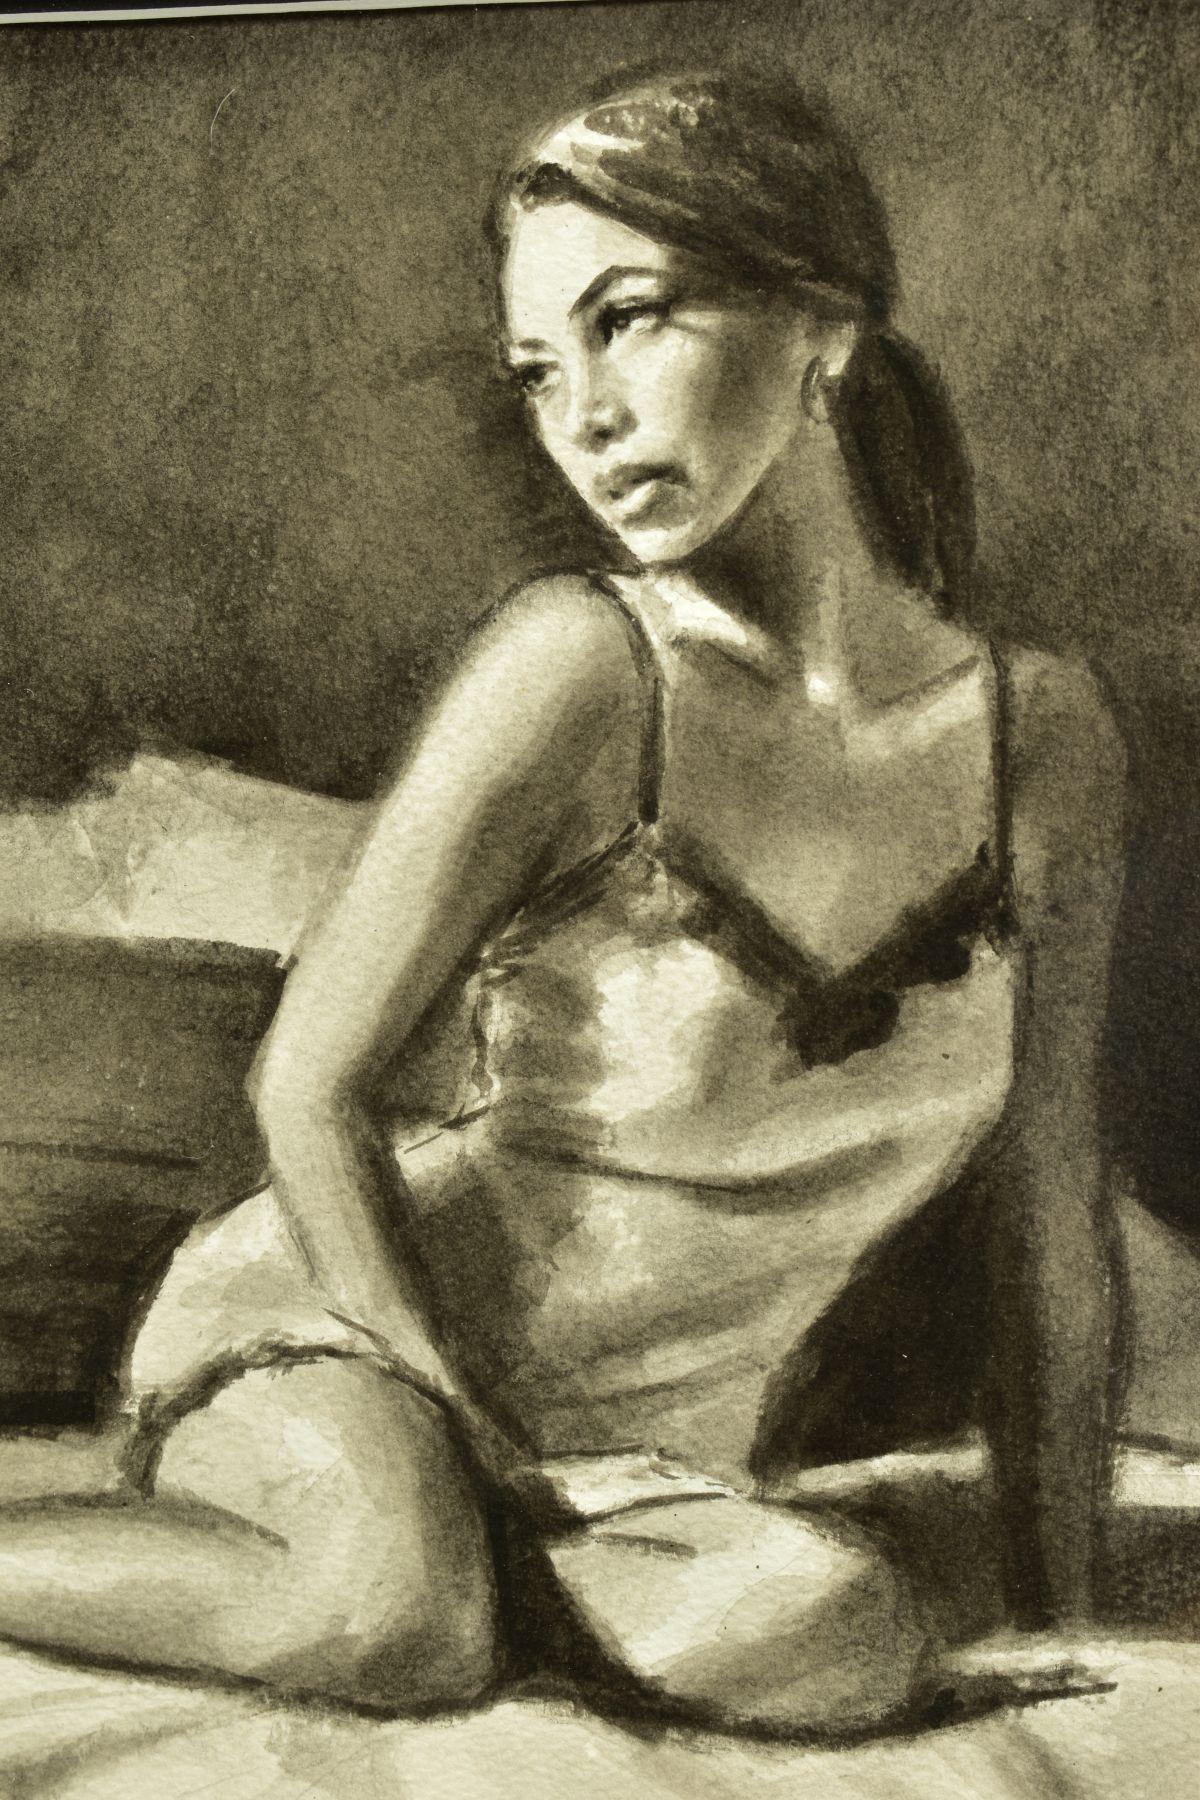 FABIAN PEREZ (ARGENTINA 1967), 'Andlucia VI', a portrait study of a scantily clad female figure, - Image 3 of 7